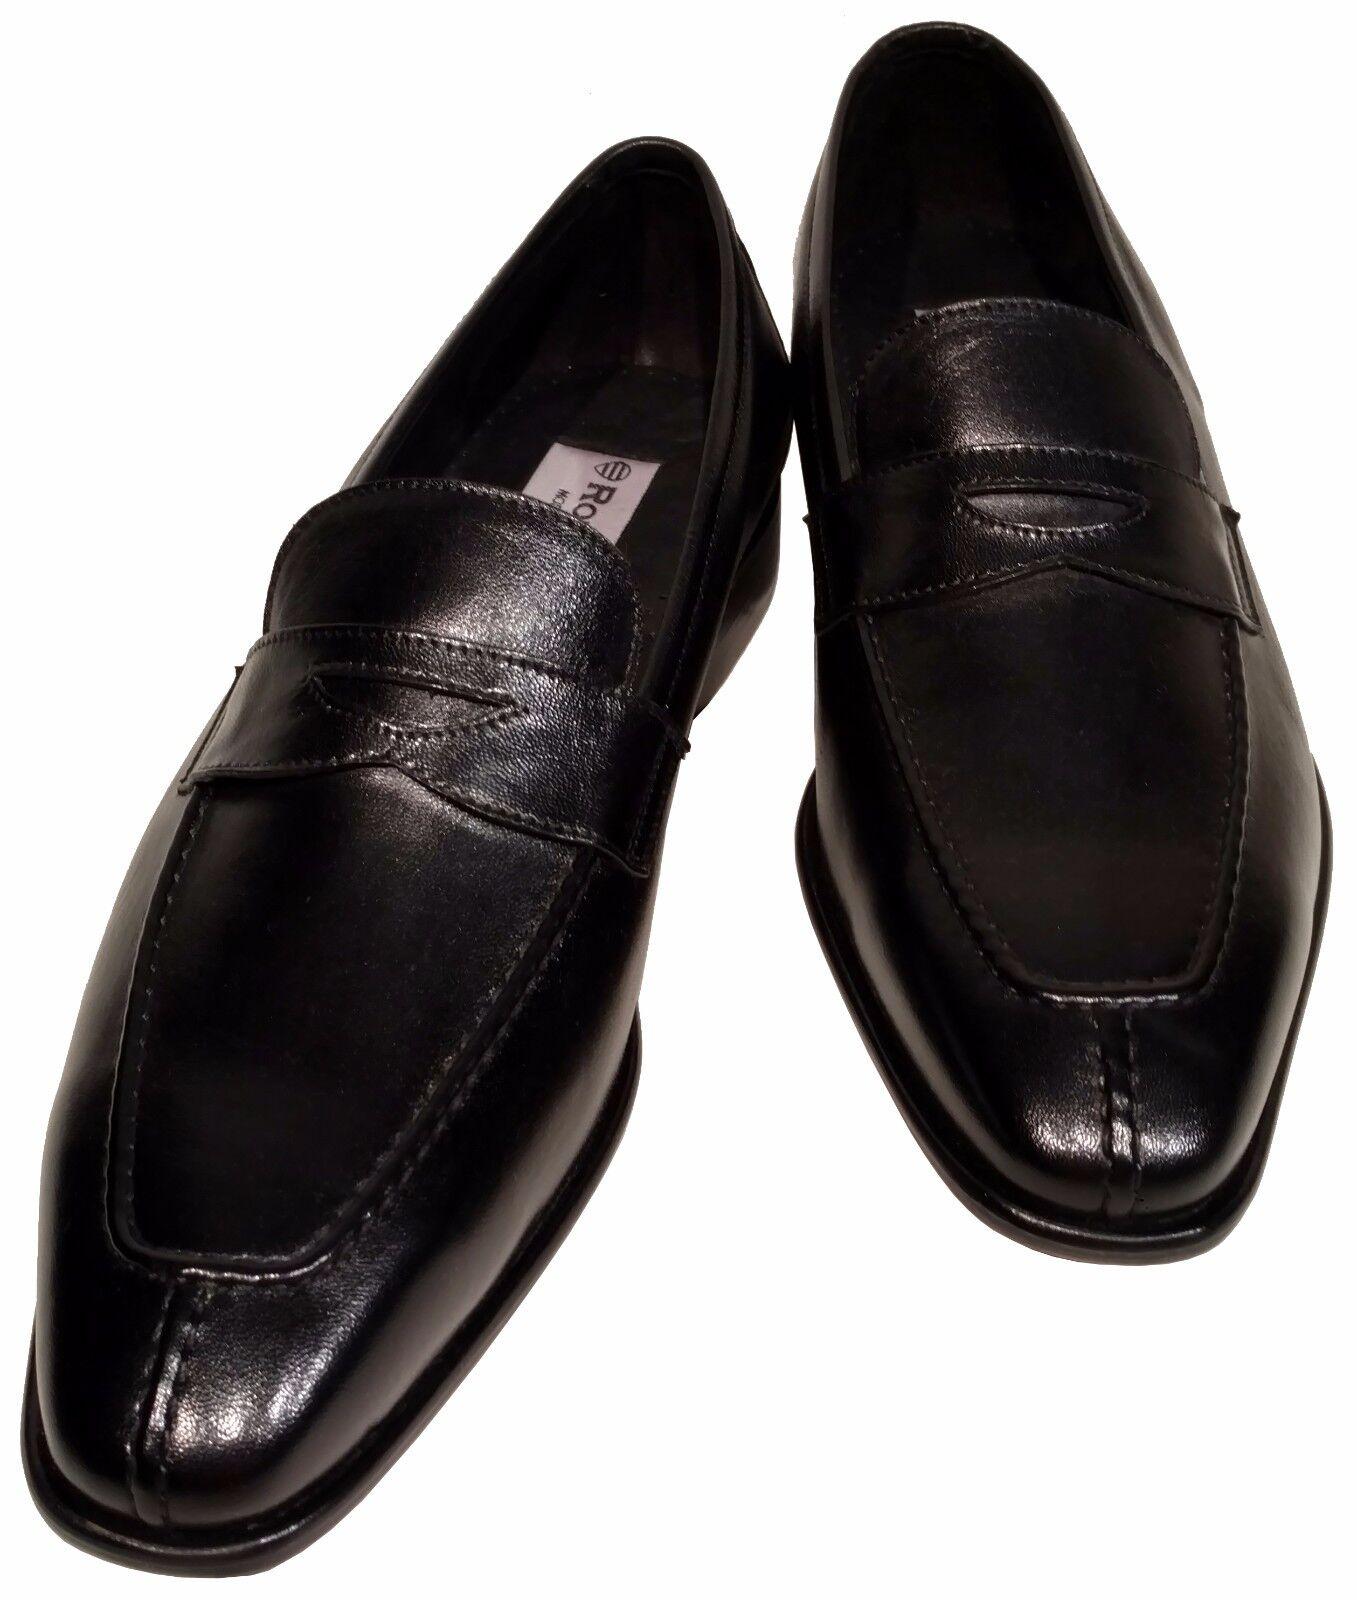 Men's Ronaldo Solid nero Italian Premium Leather Slip On Loafer Dress scarpe